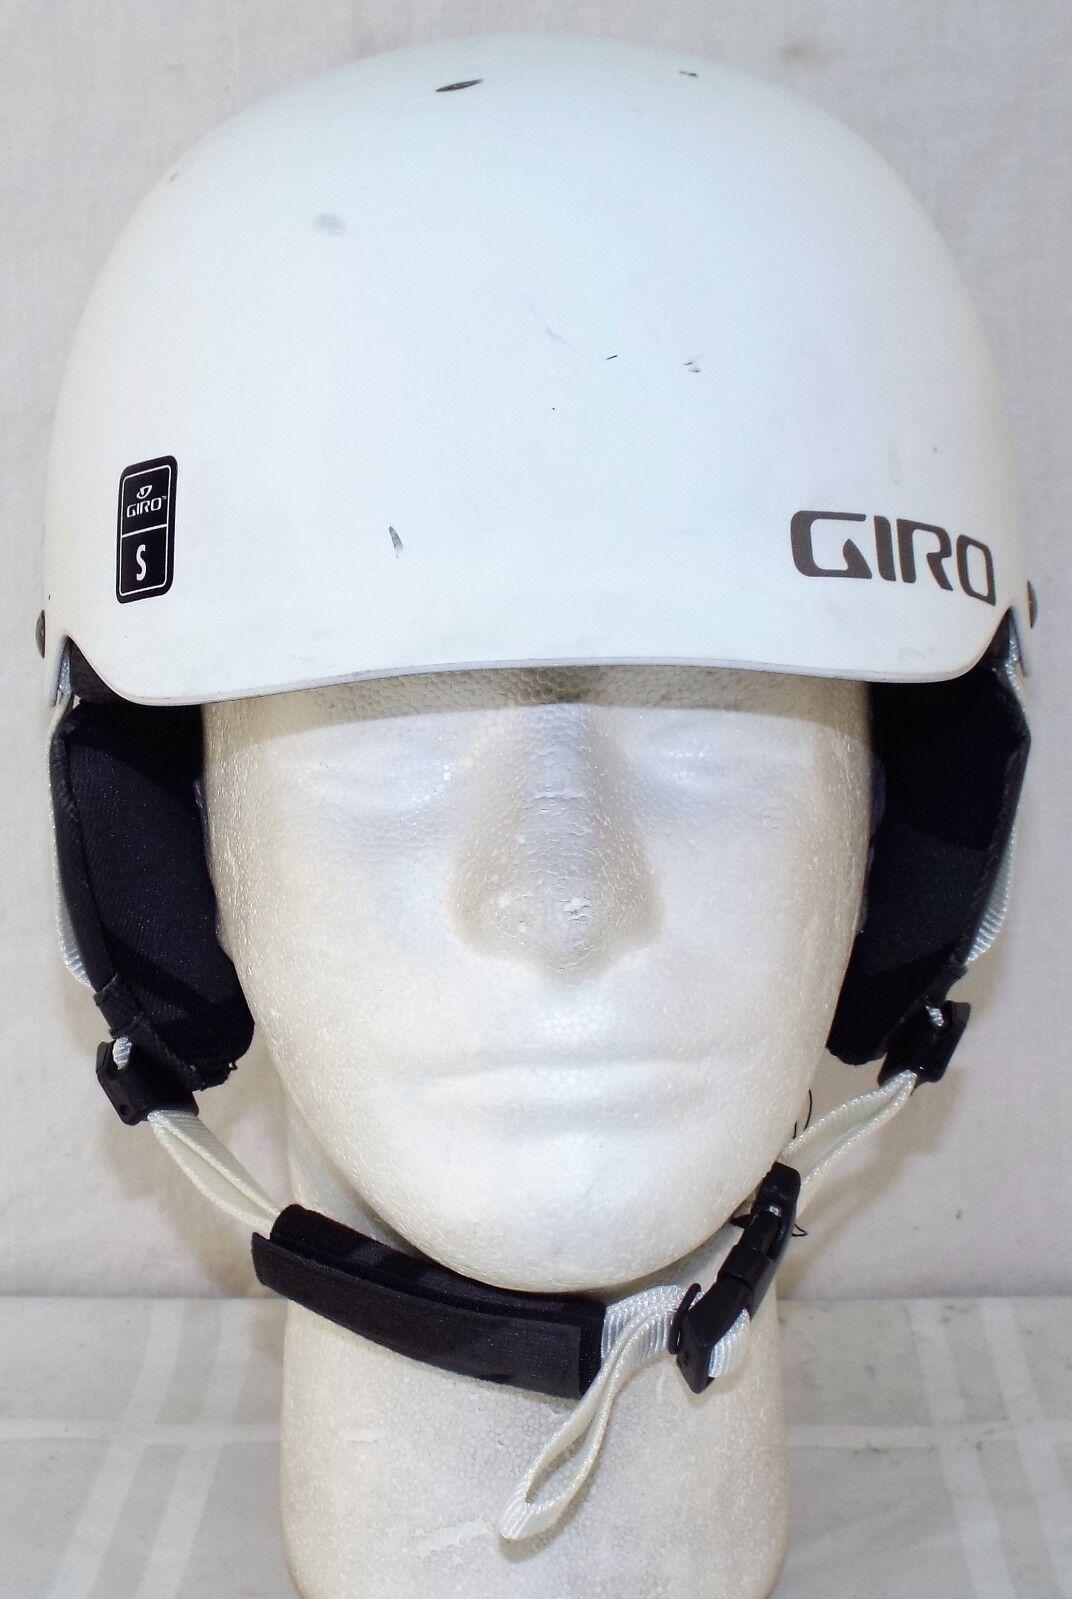 Giro Surface S - New Ski Helmet Size Small